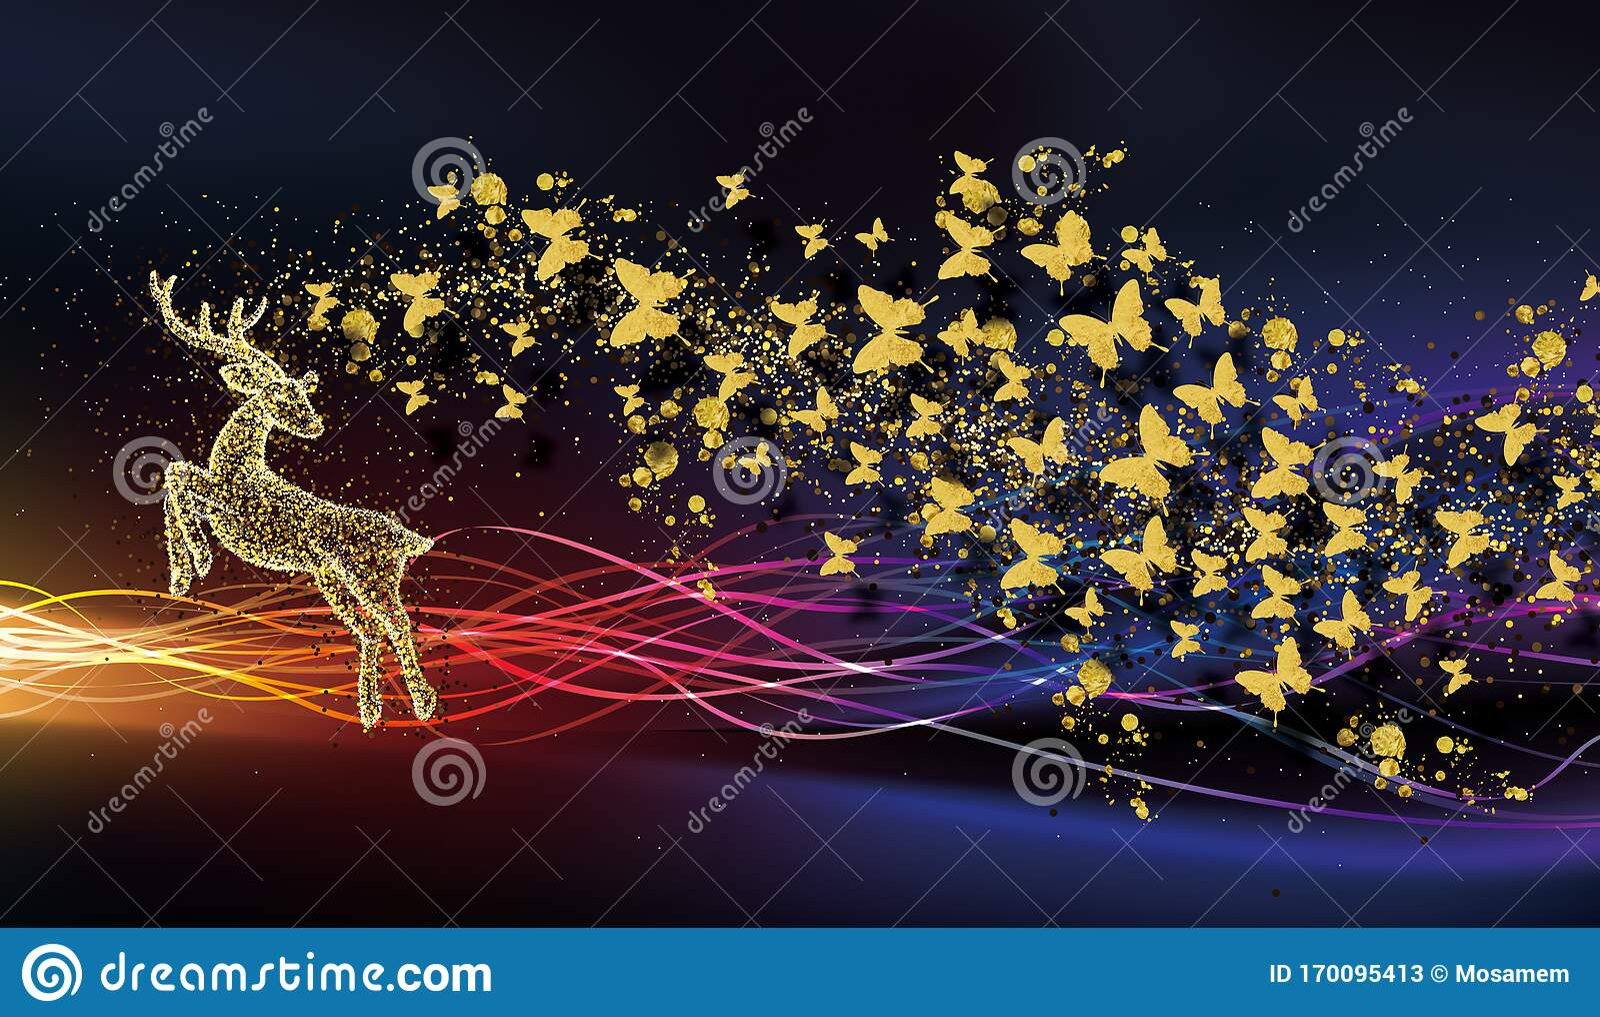 3d Modern Art Mural Wallpaper With Dark Blue Jungle Forest Background Golden Deer Black Christmas Tree Mountain Moon Wit Stock Illustration Illustration Of Meadow Gold 170095413